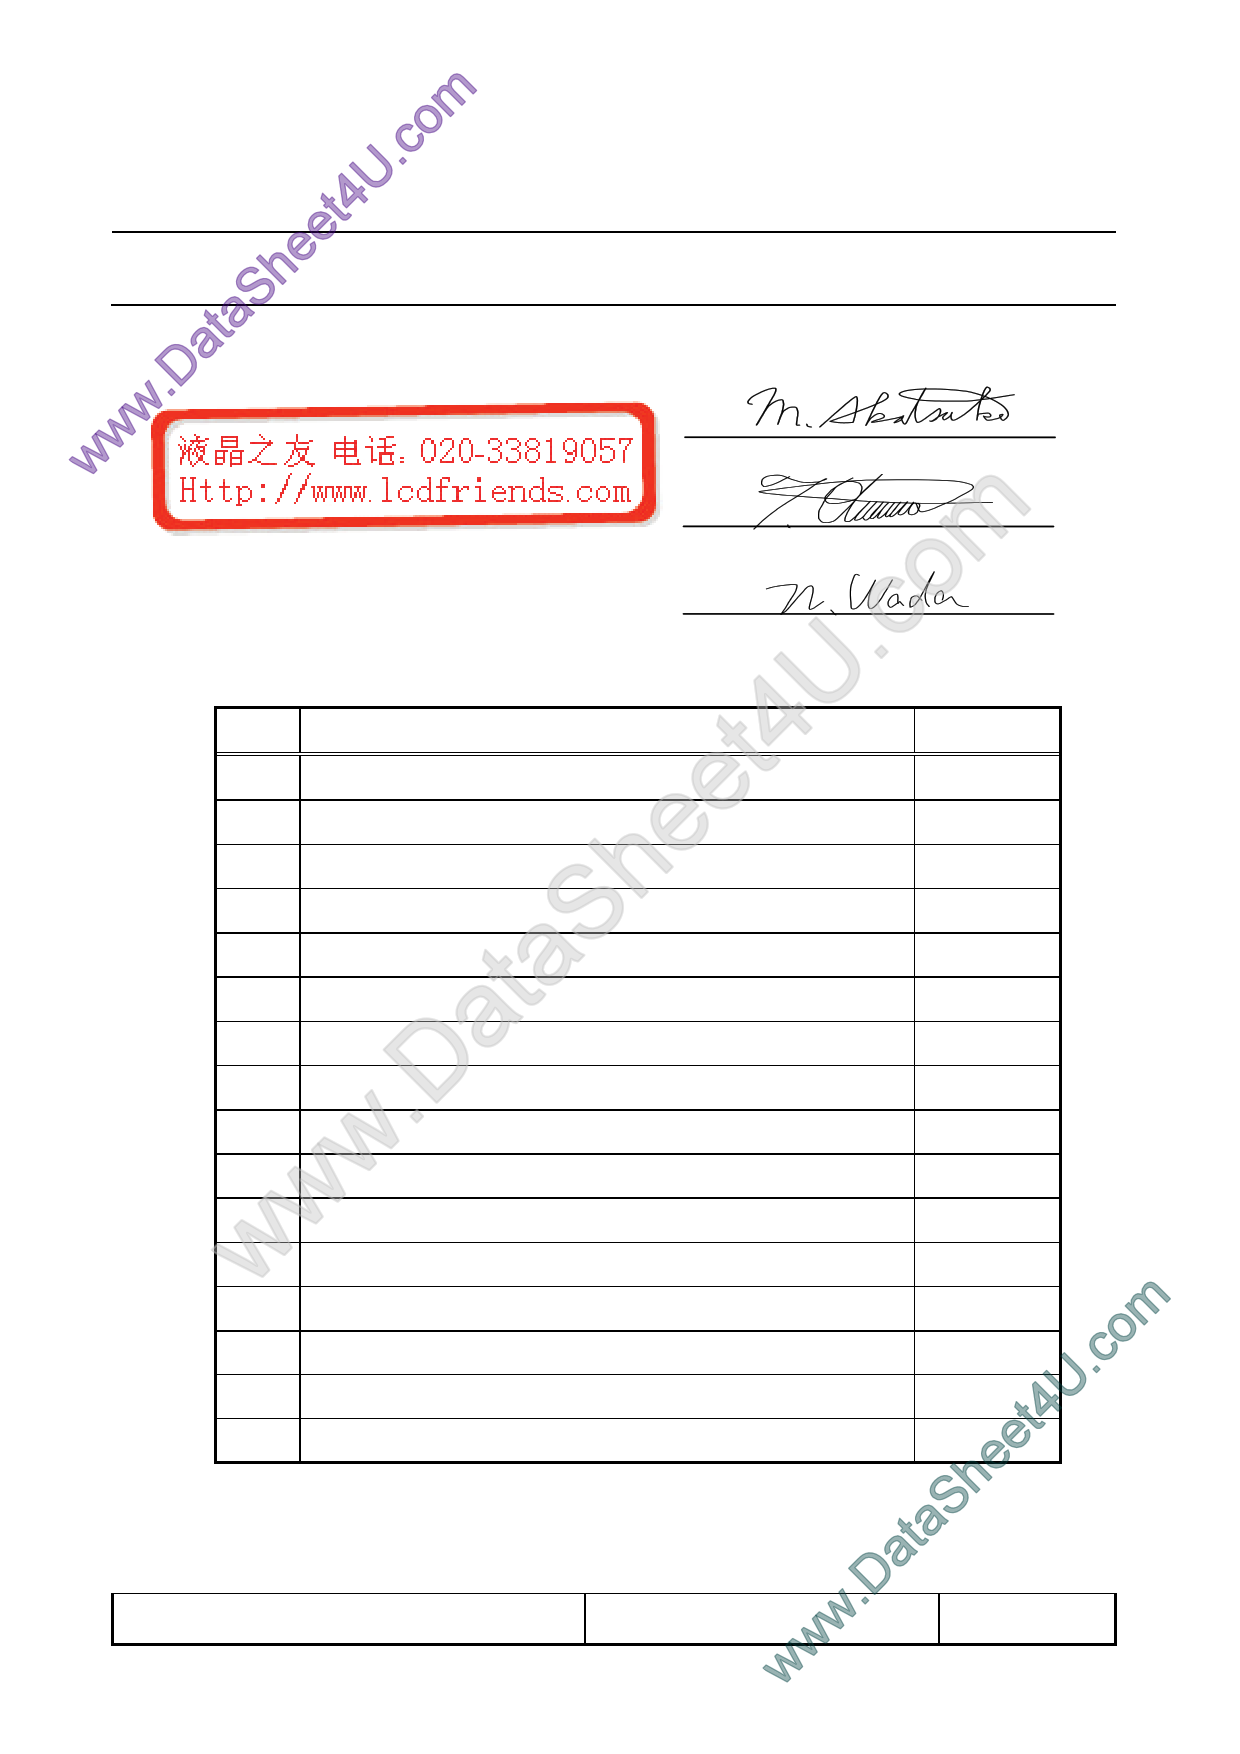 T-51756D121J-FW-A-AA دیتاشیت PDF